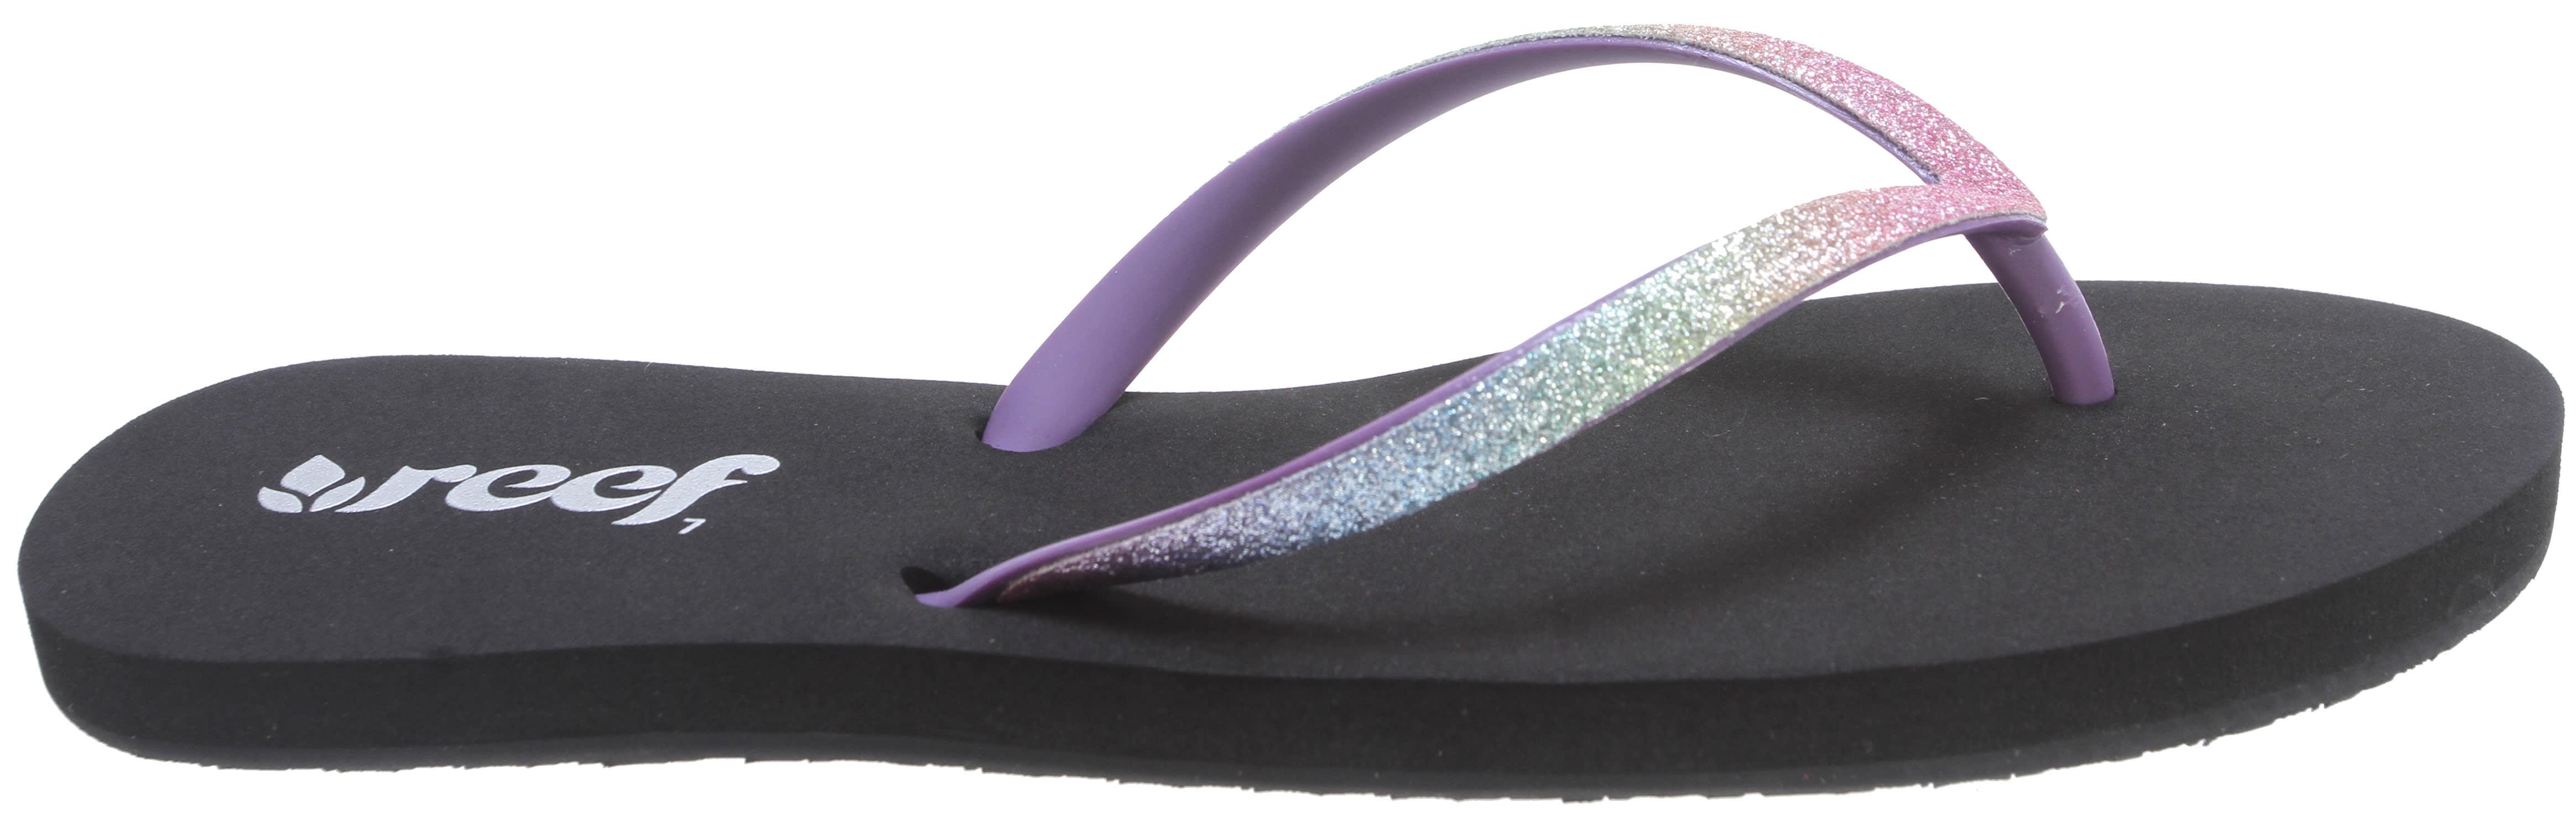 Reef Stargazer Luxe Sandals - thumbnail 1